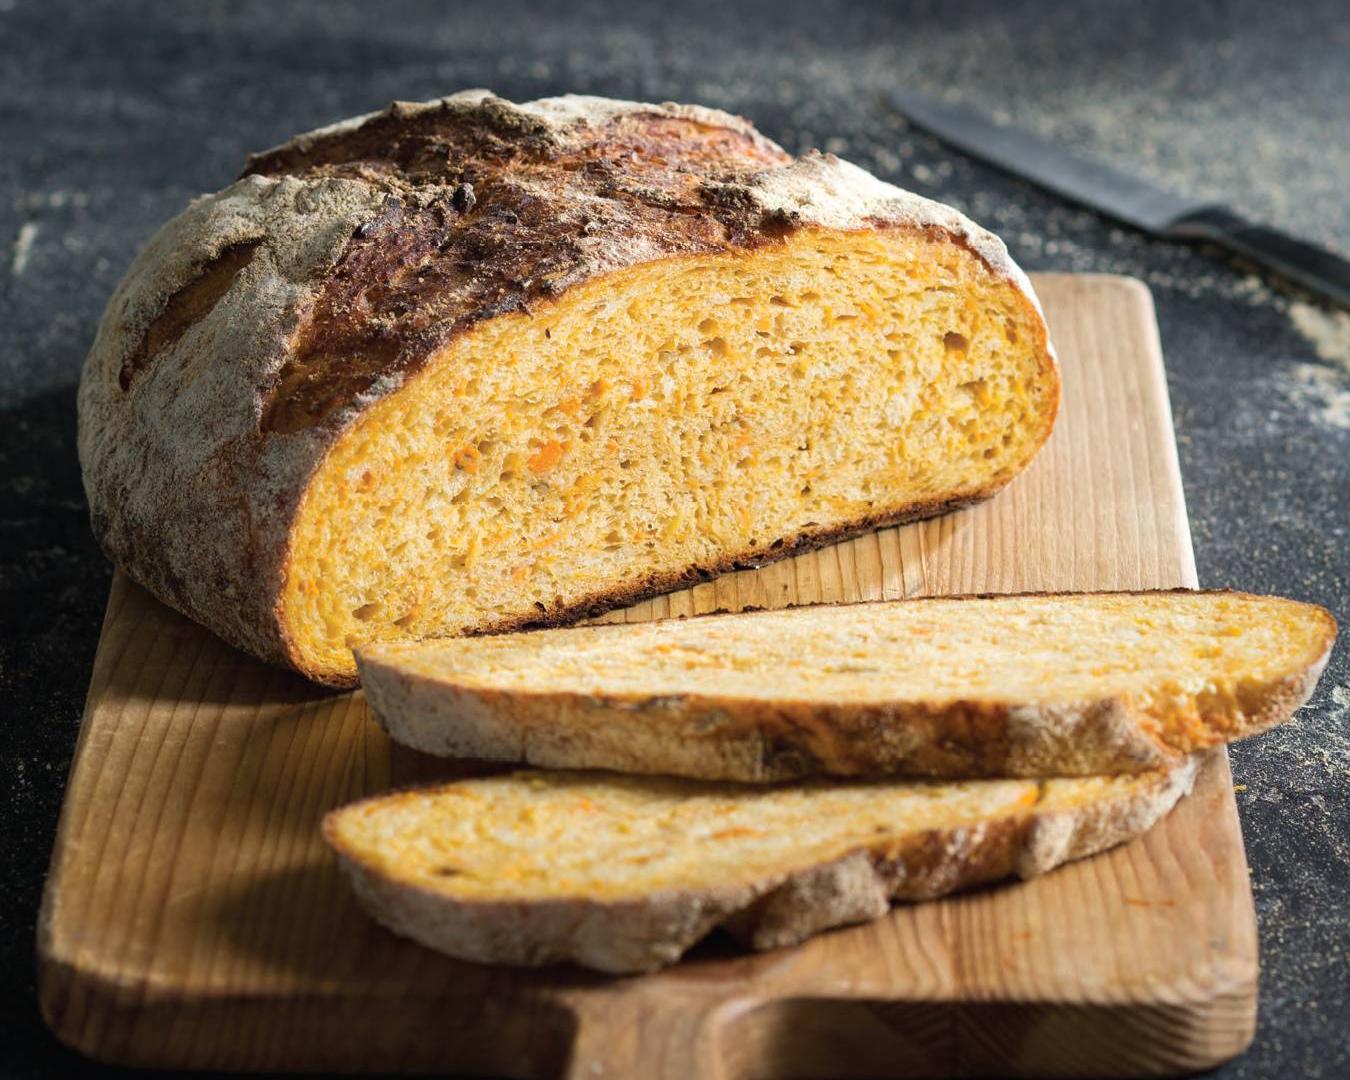 Sweet Potato Dutch Oven Bread Bake From Scratch